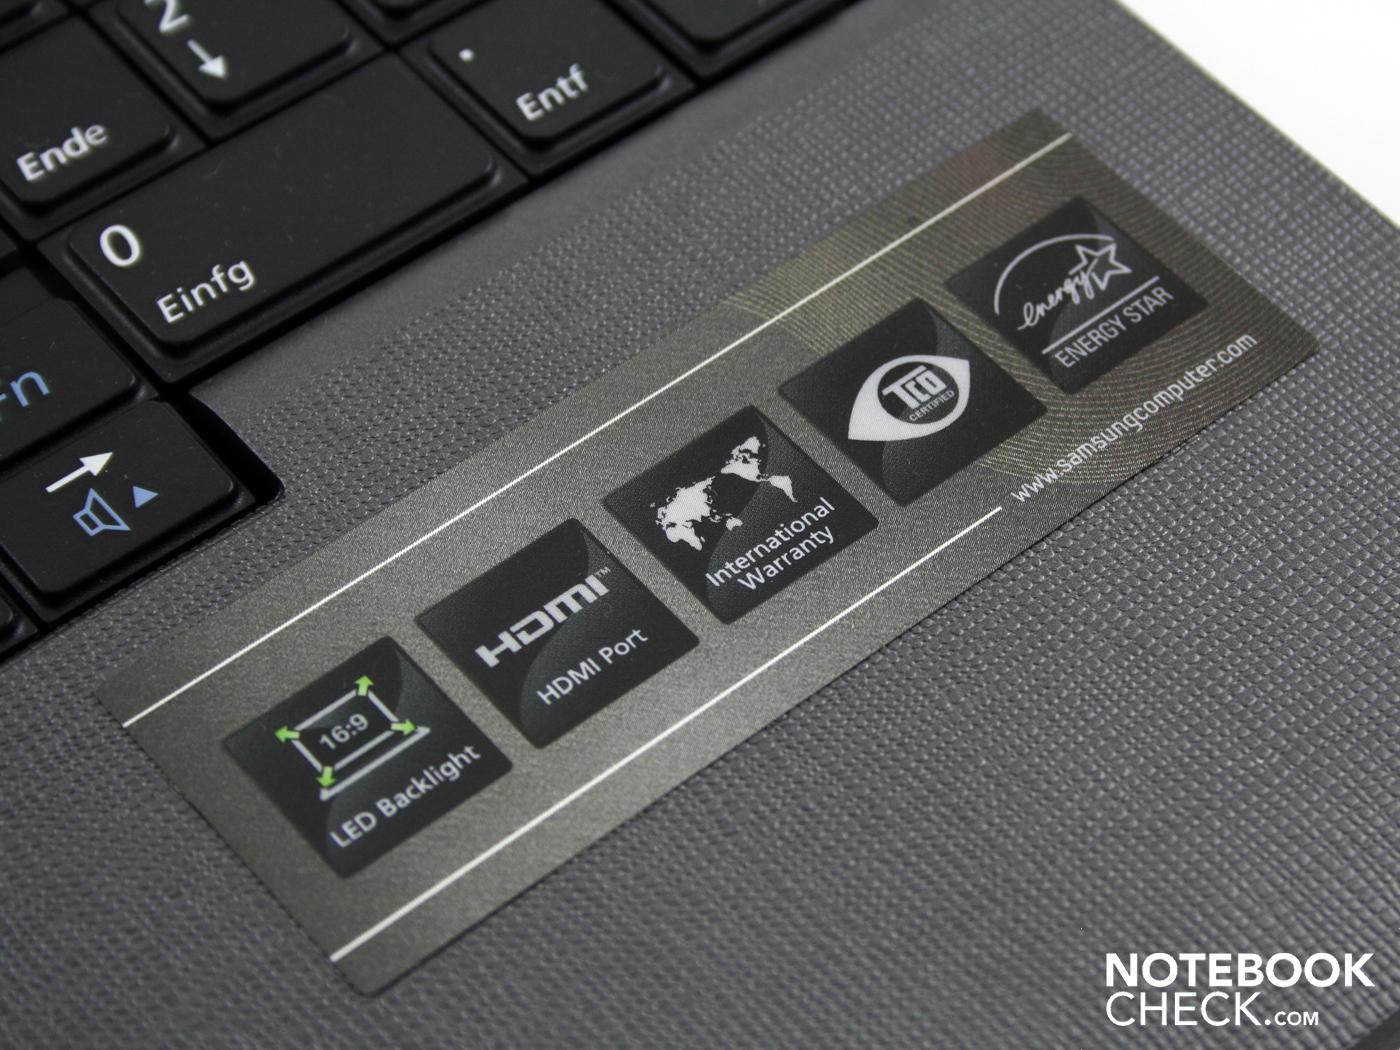 samsung r530 serisi notebook - photo #33